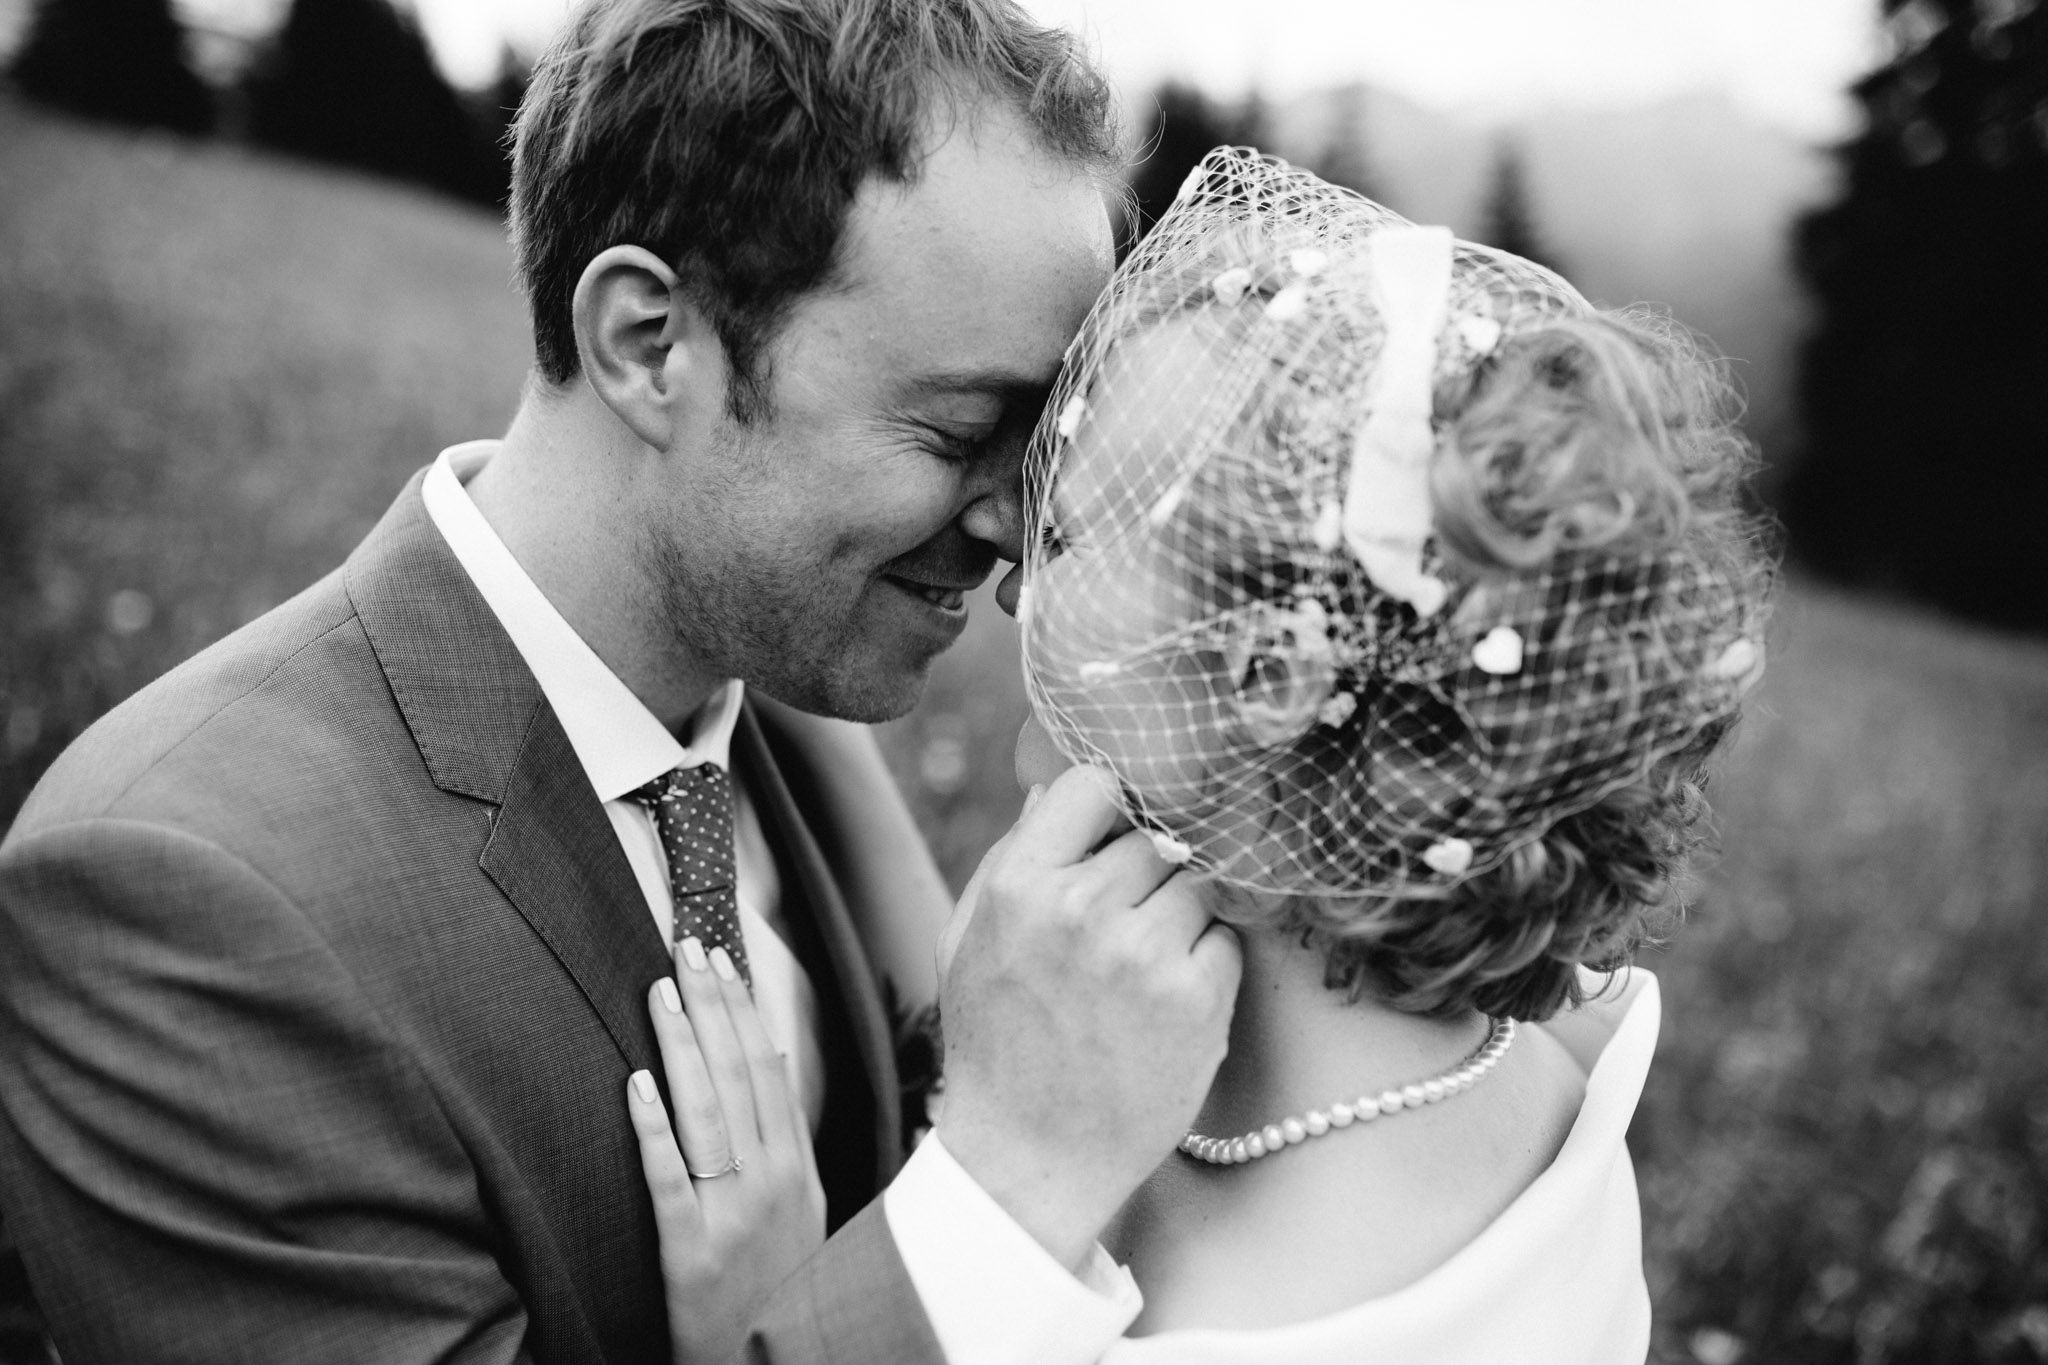 Lenl-Simmental-Buehlerhof-Pia-Anna-Christian-Wedding-Photography-EK-55.jpg